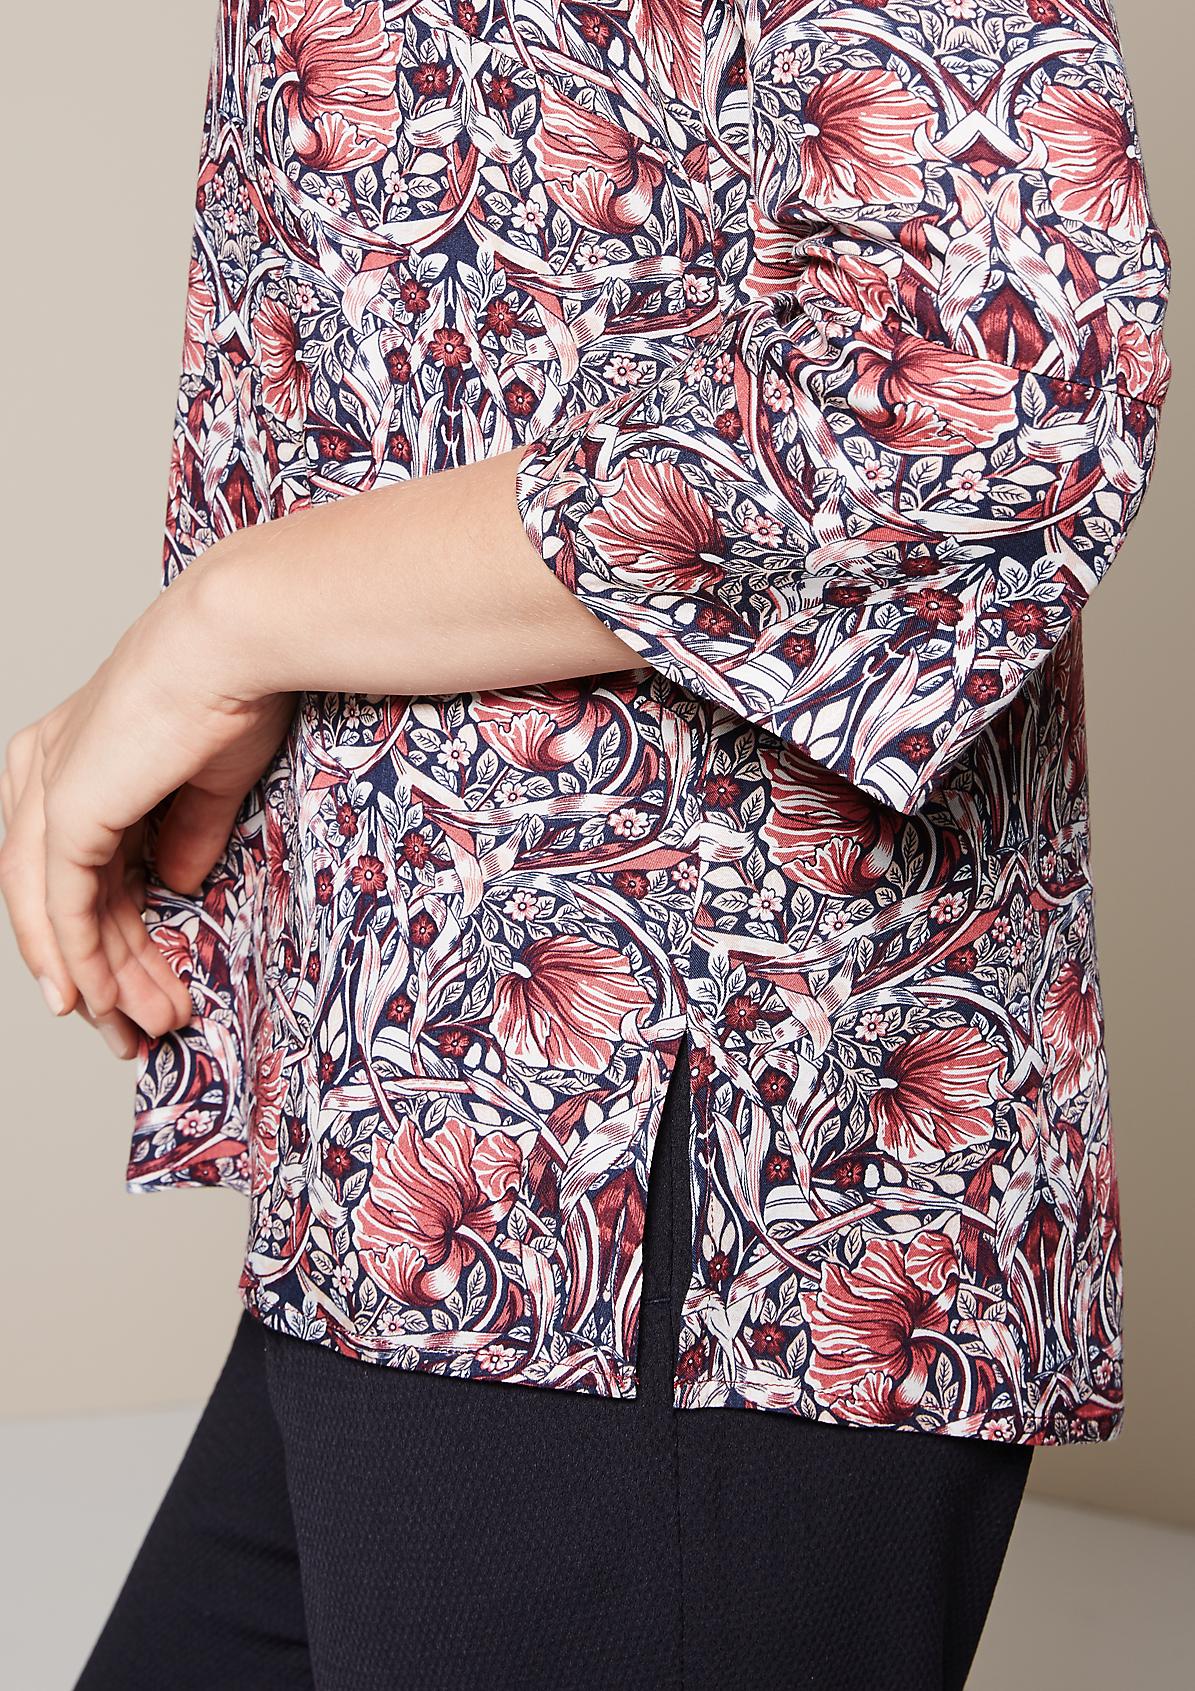 Edle 3/4-Arm Bluse mit dekorativem Allovermuster